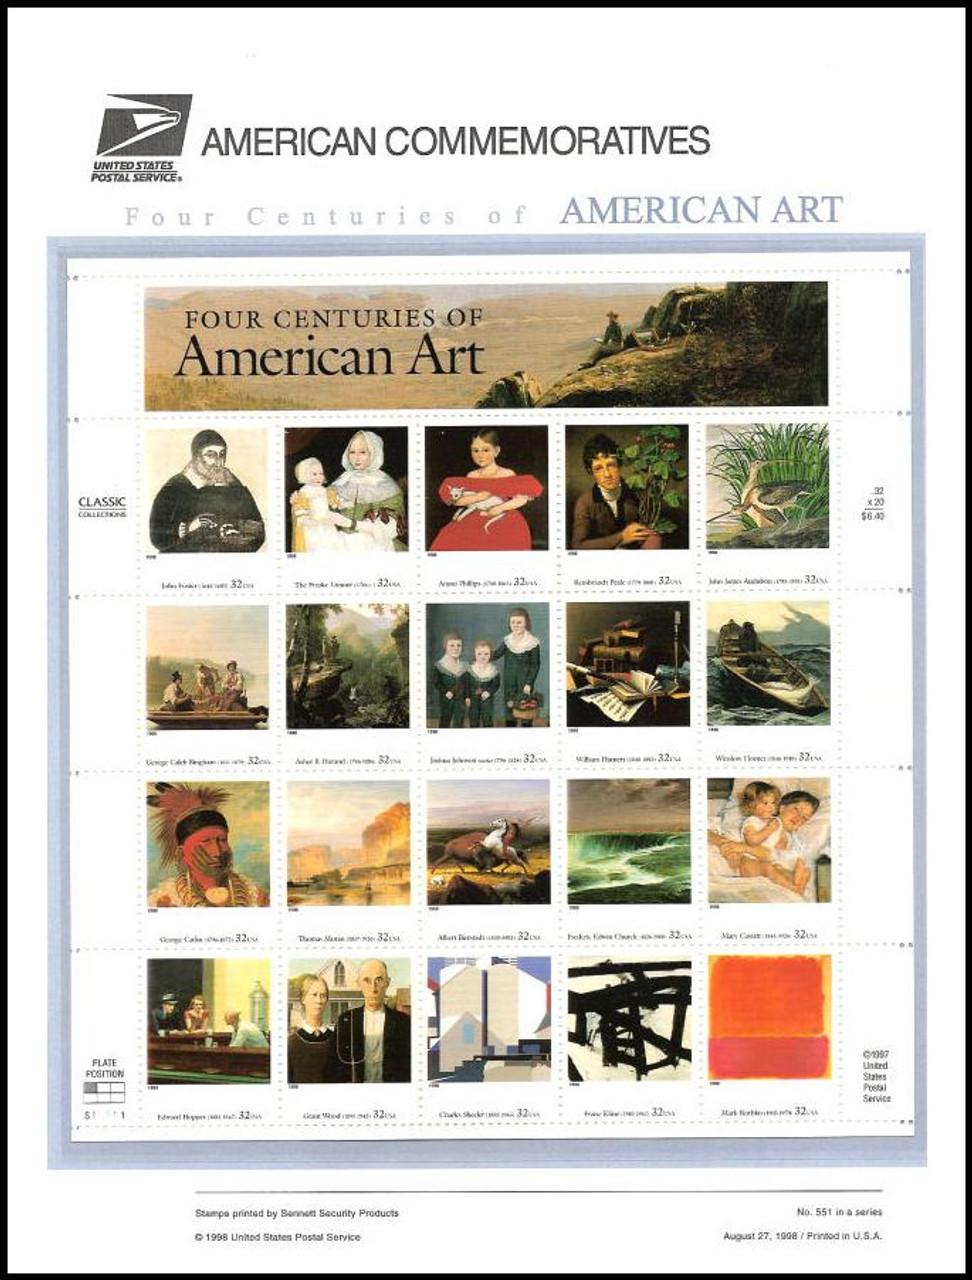 3236 / 32c Four Centuries of American Art Pane of 20 ( 2 Panel Set ) 1998 USPS American Commemorative Panel Sealed #551